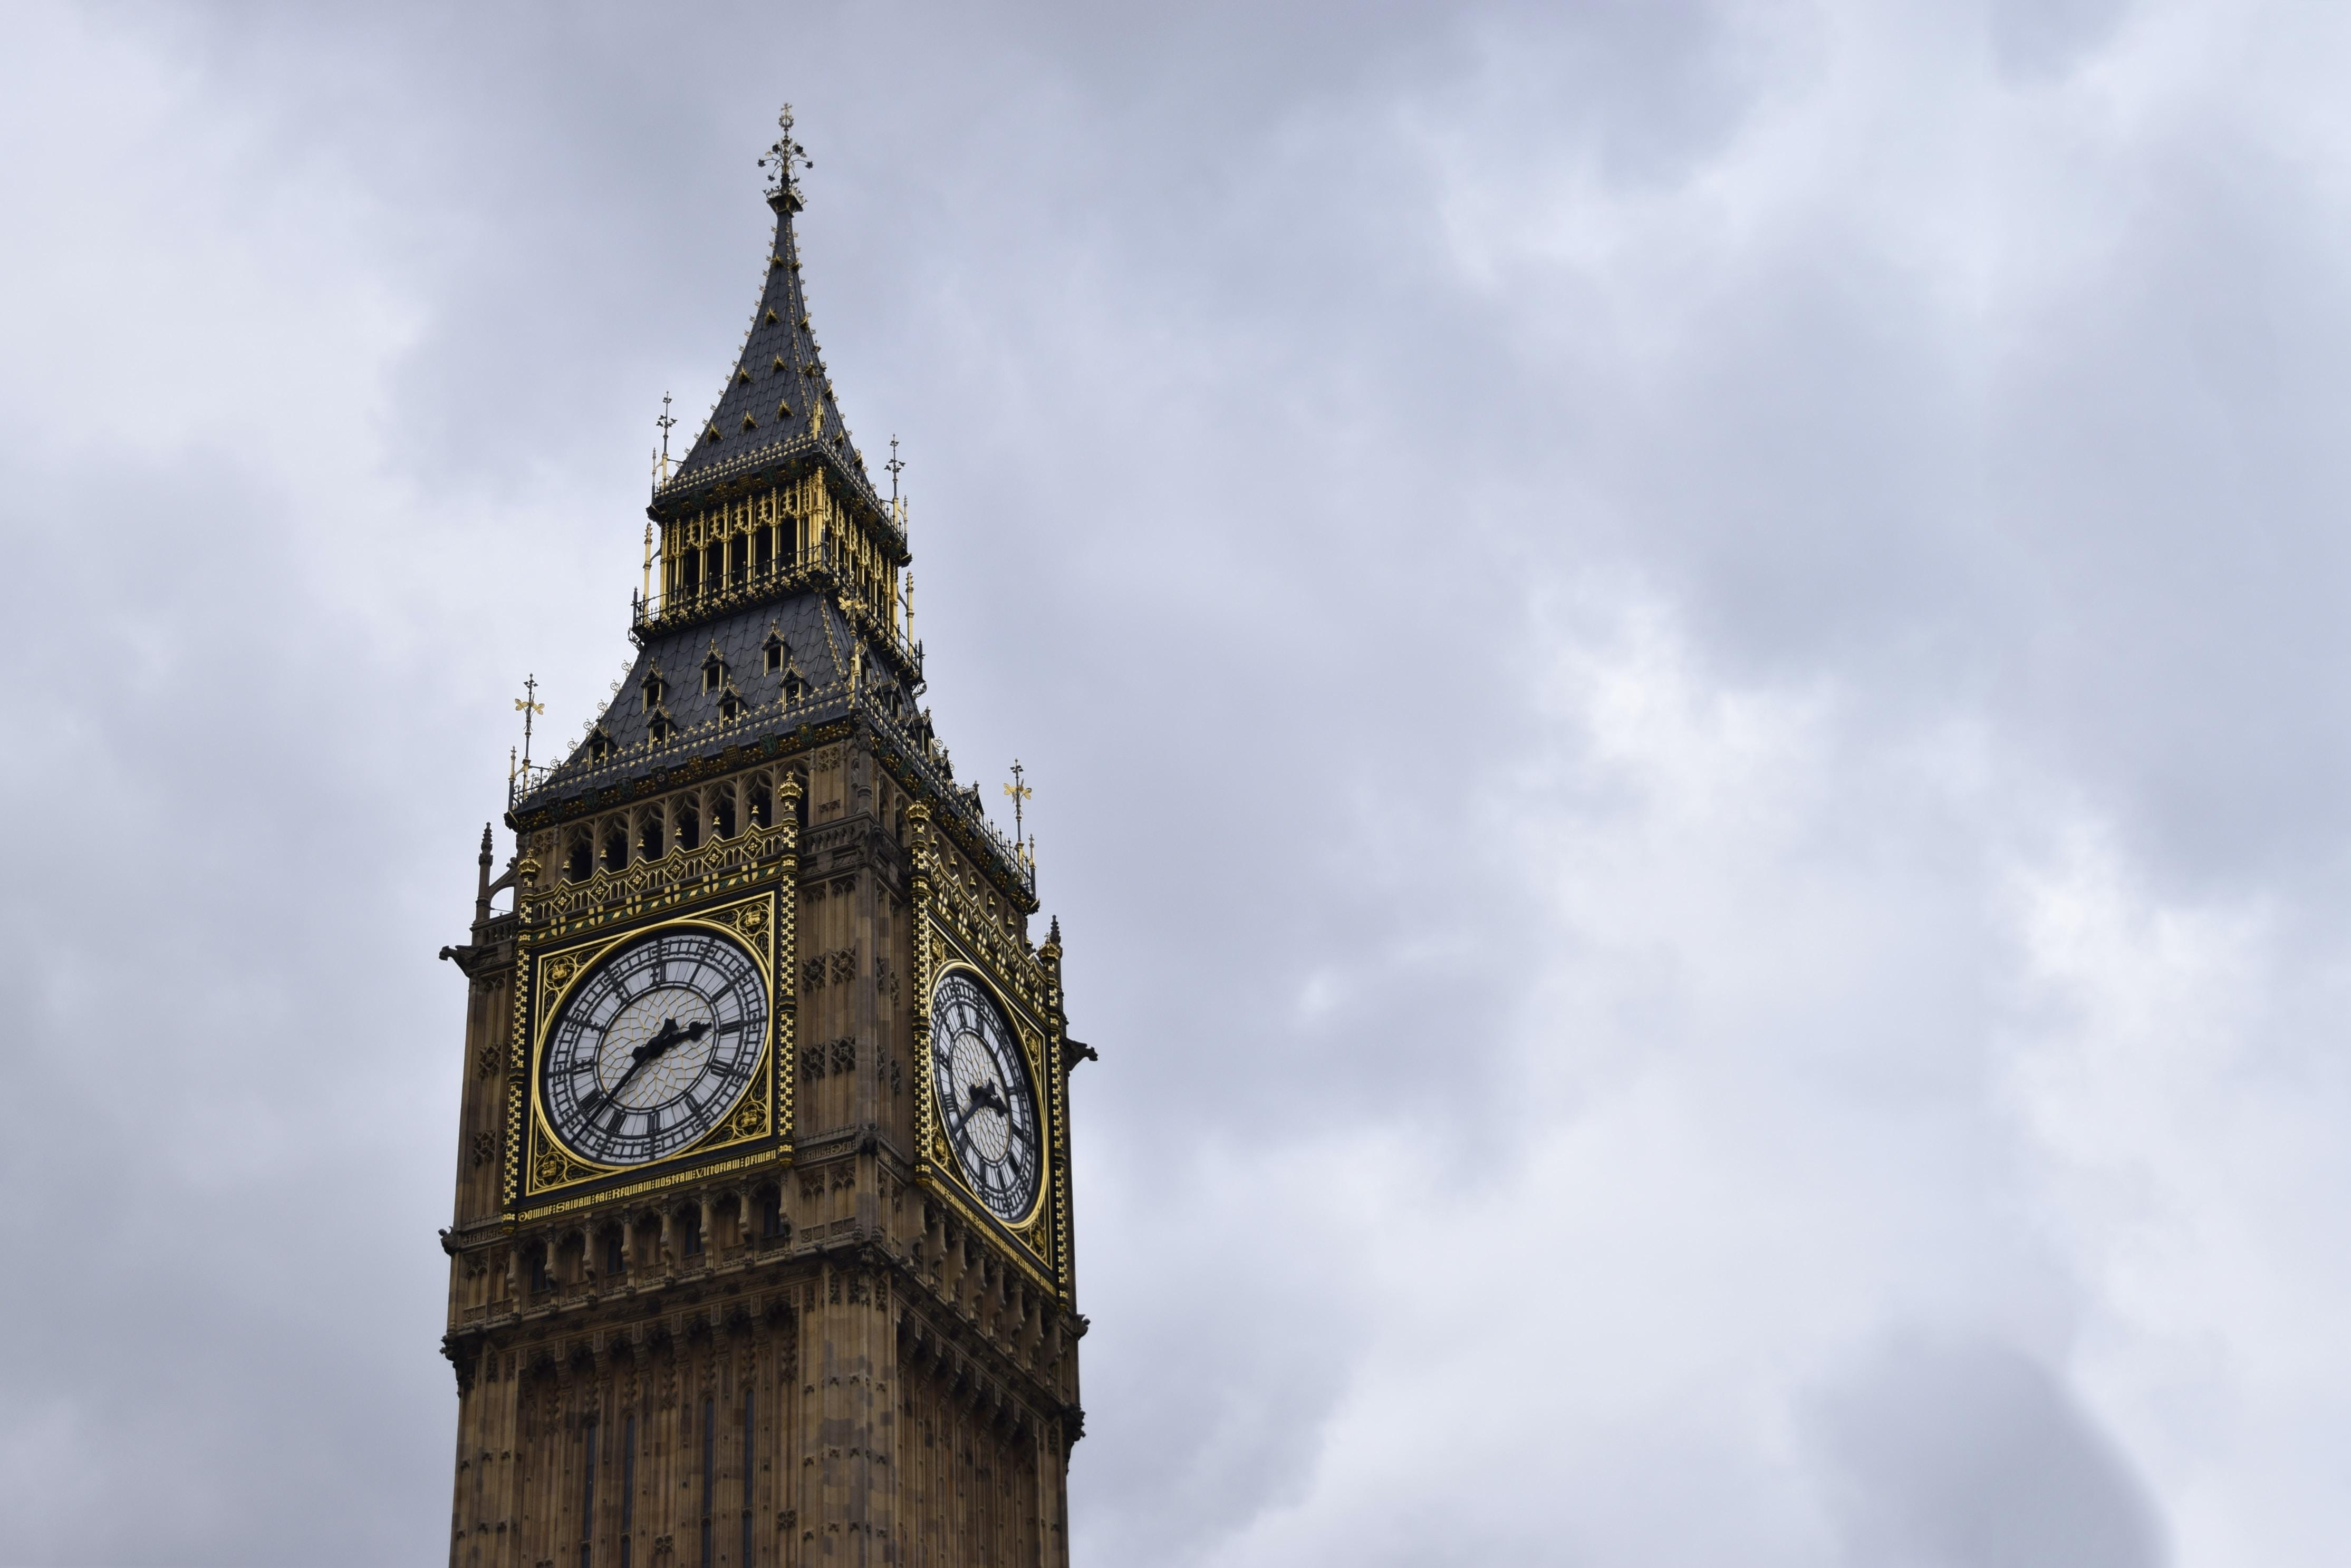 Elizabeth Tower